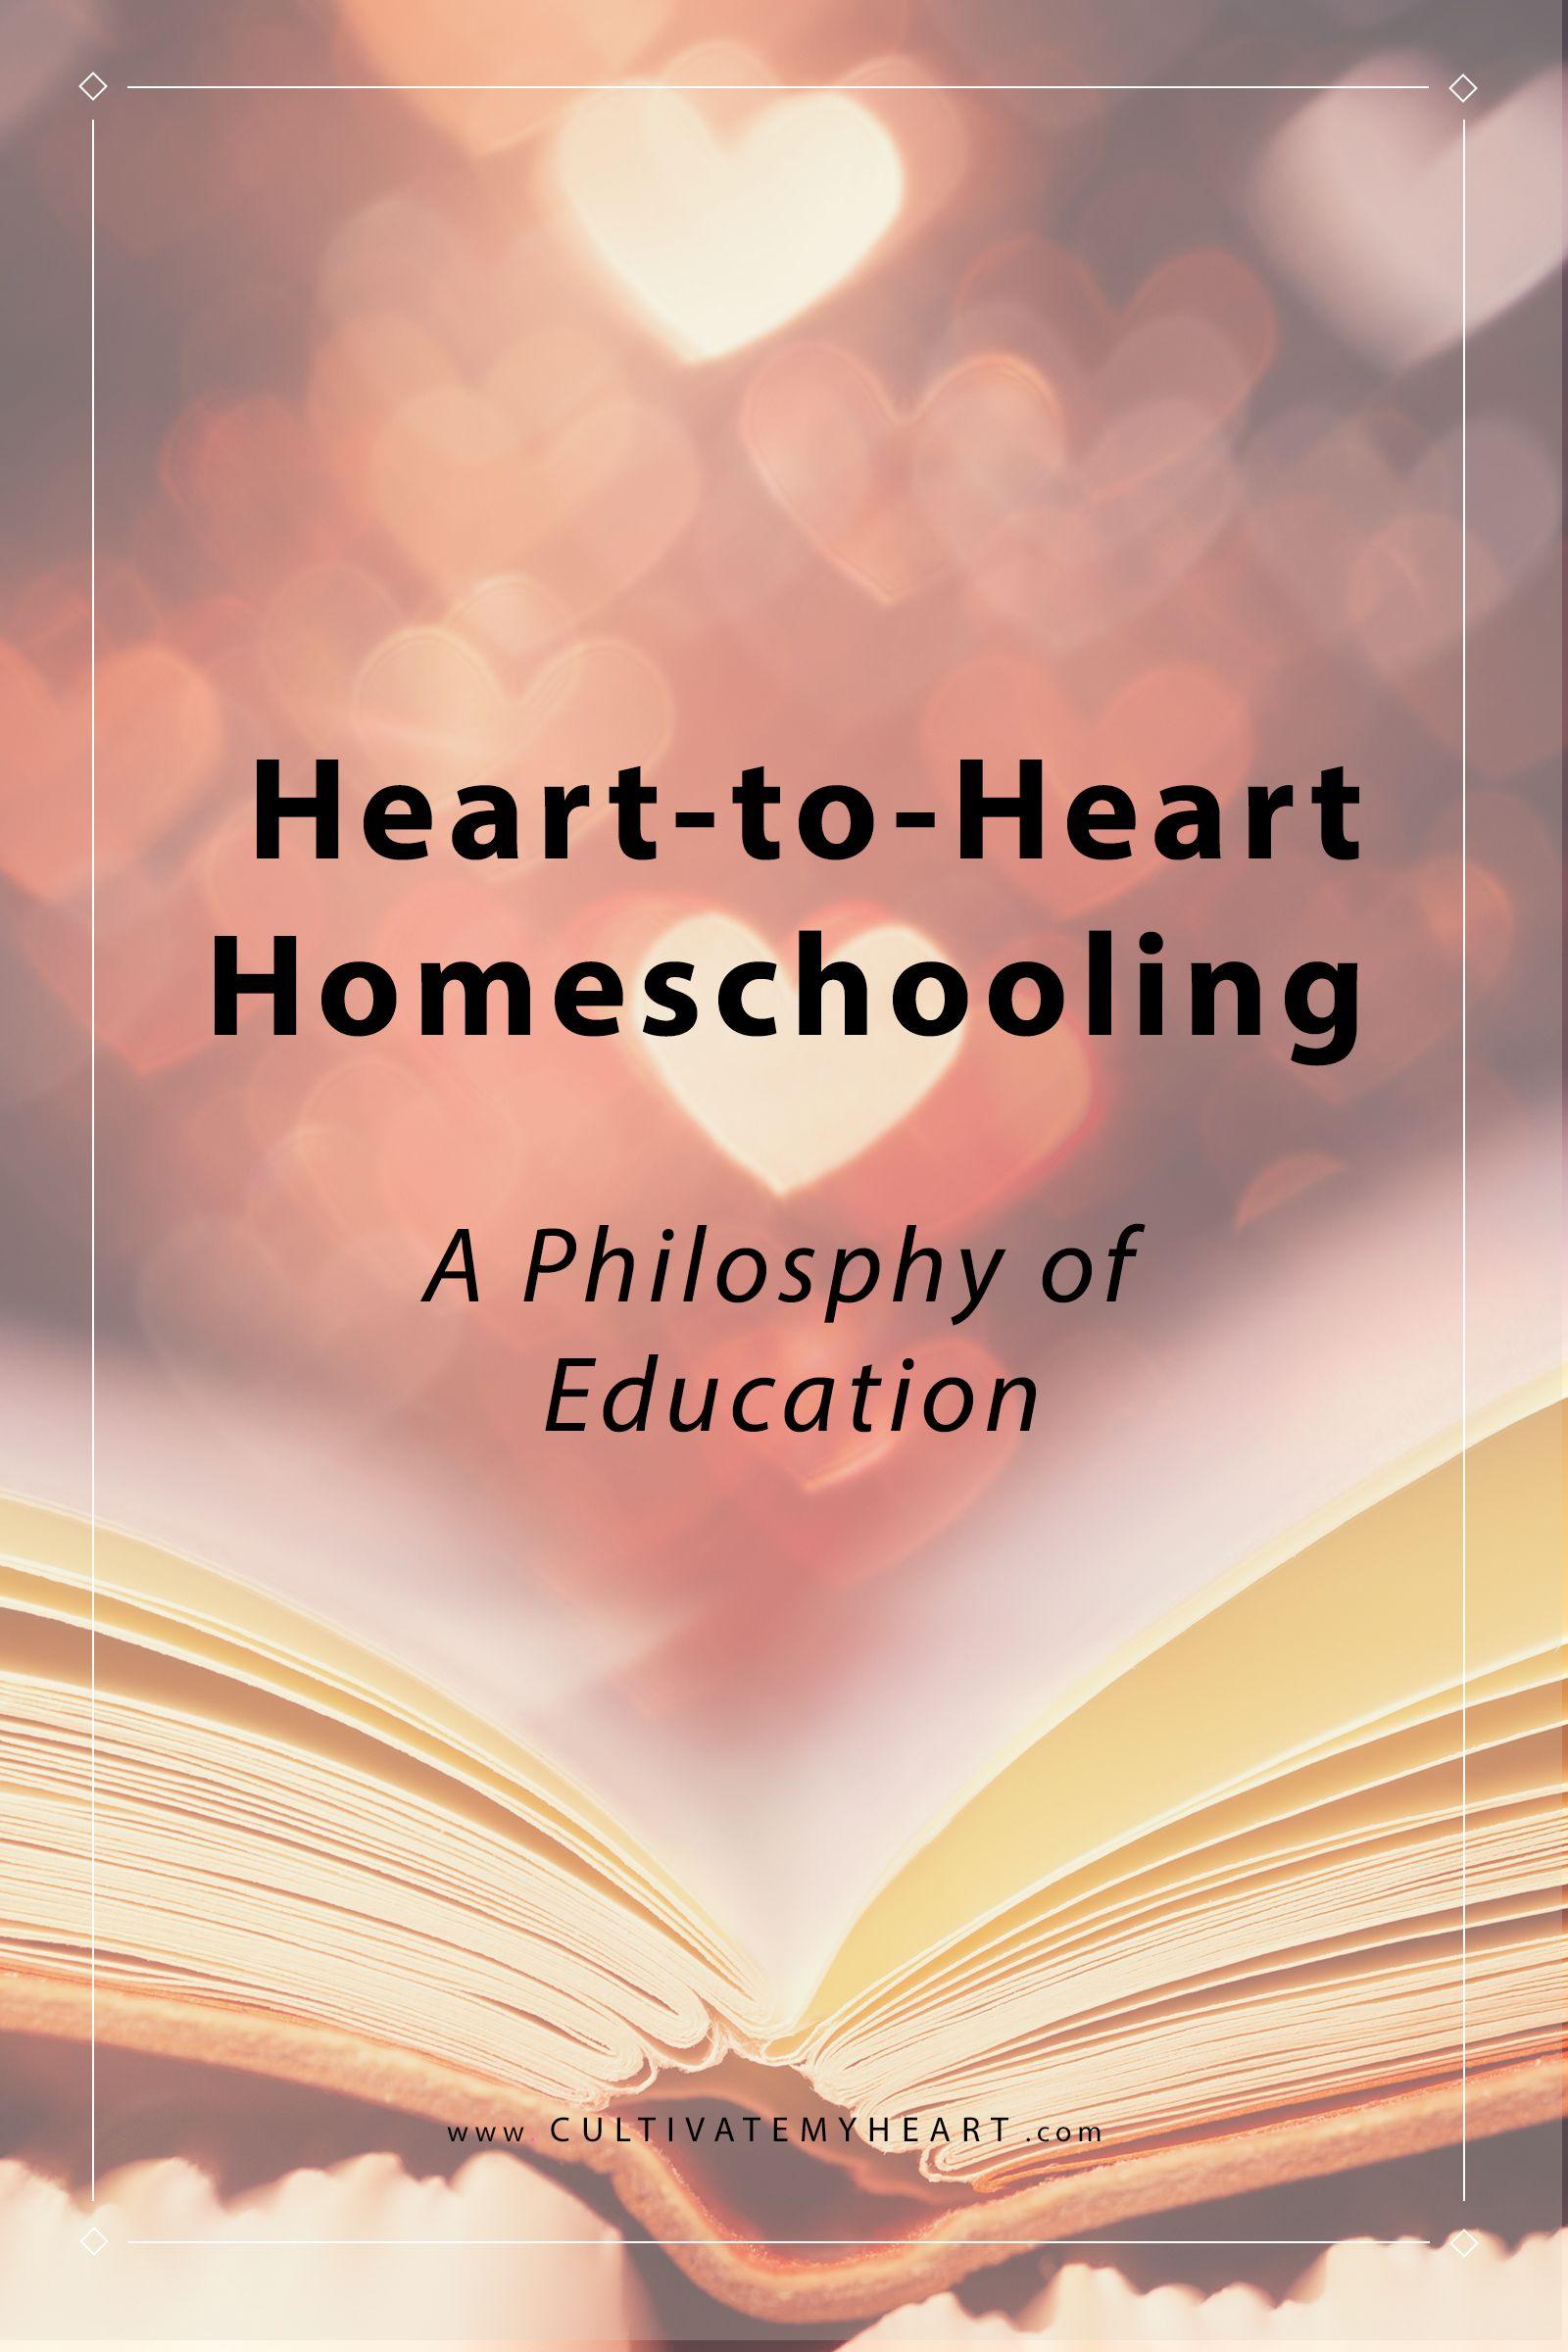 A Philosophy of Education: Heart-to-Heart Homeschooling | Homeschool ...